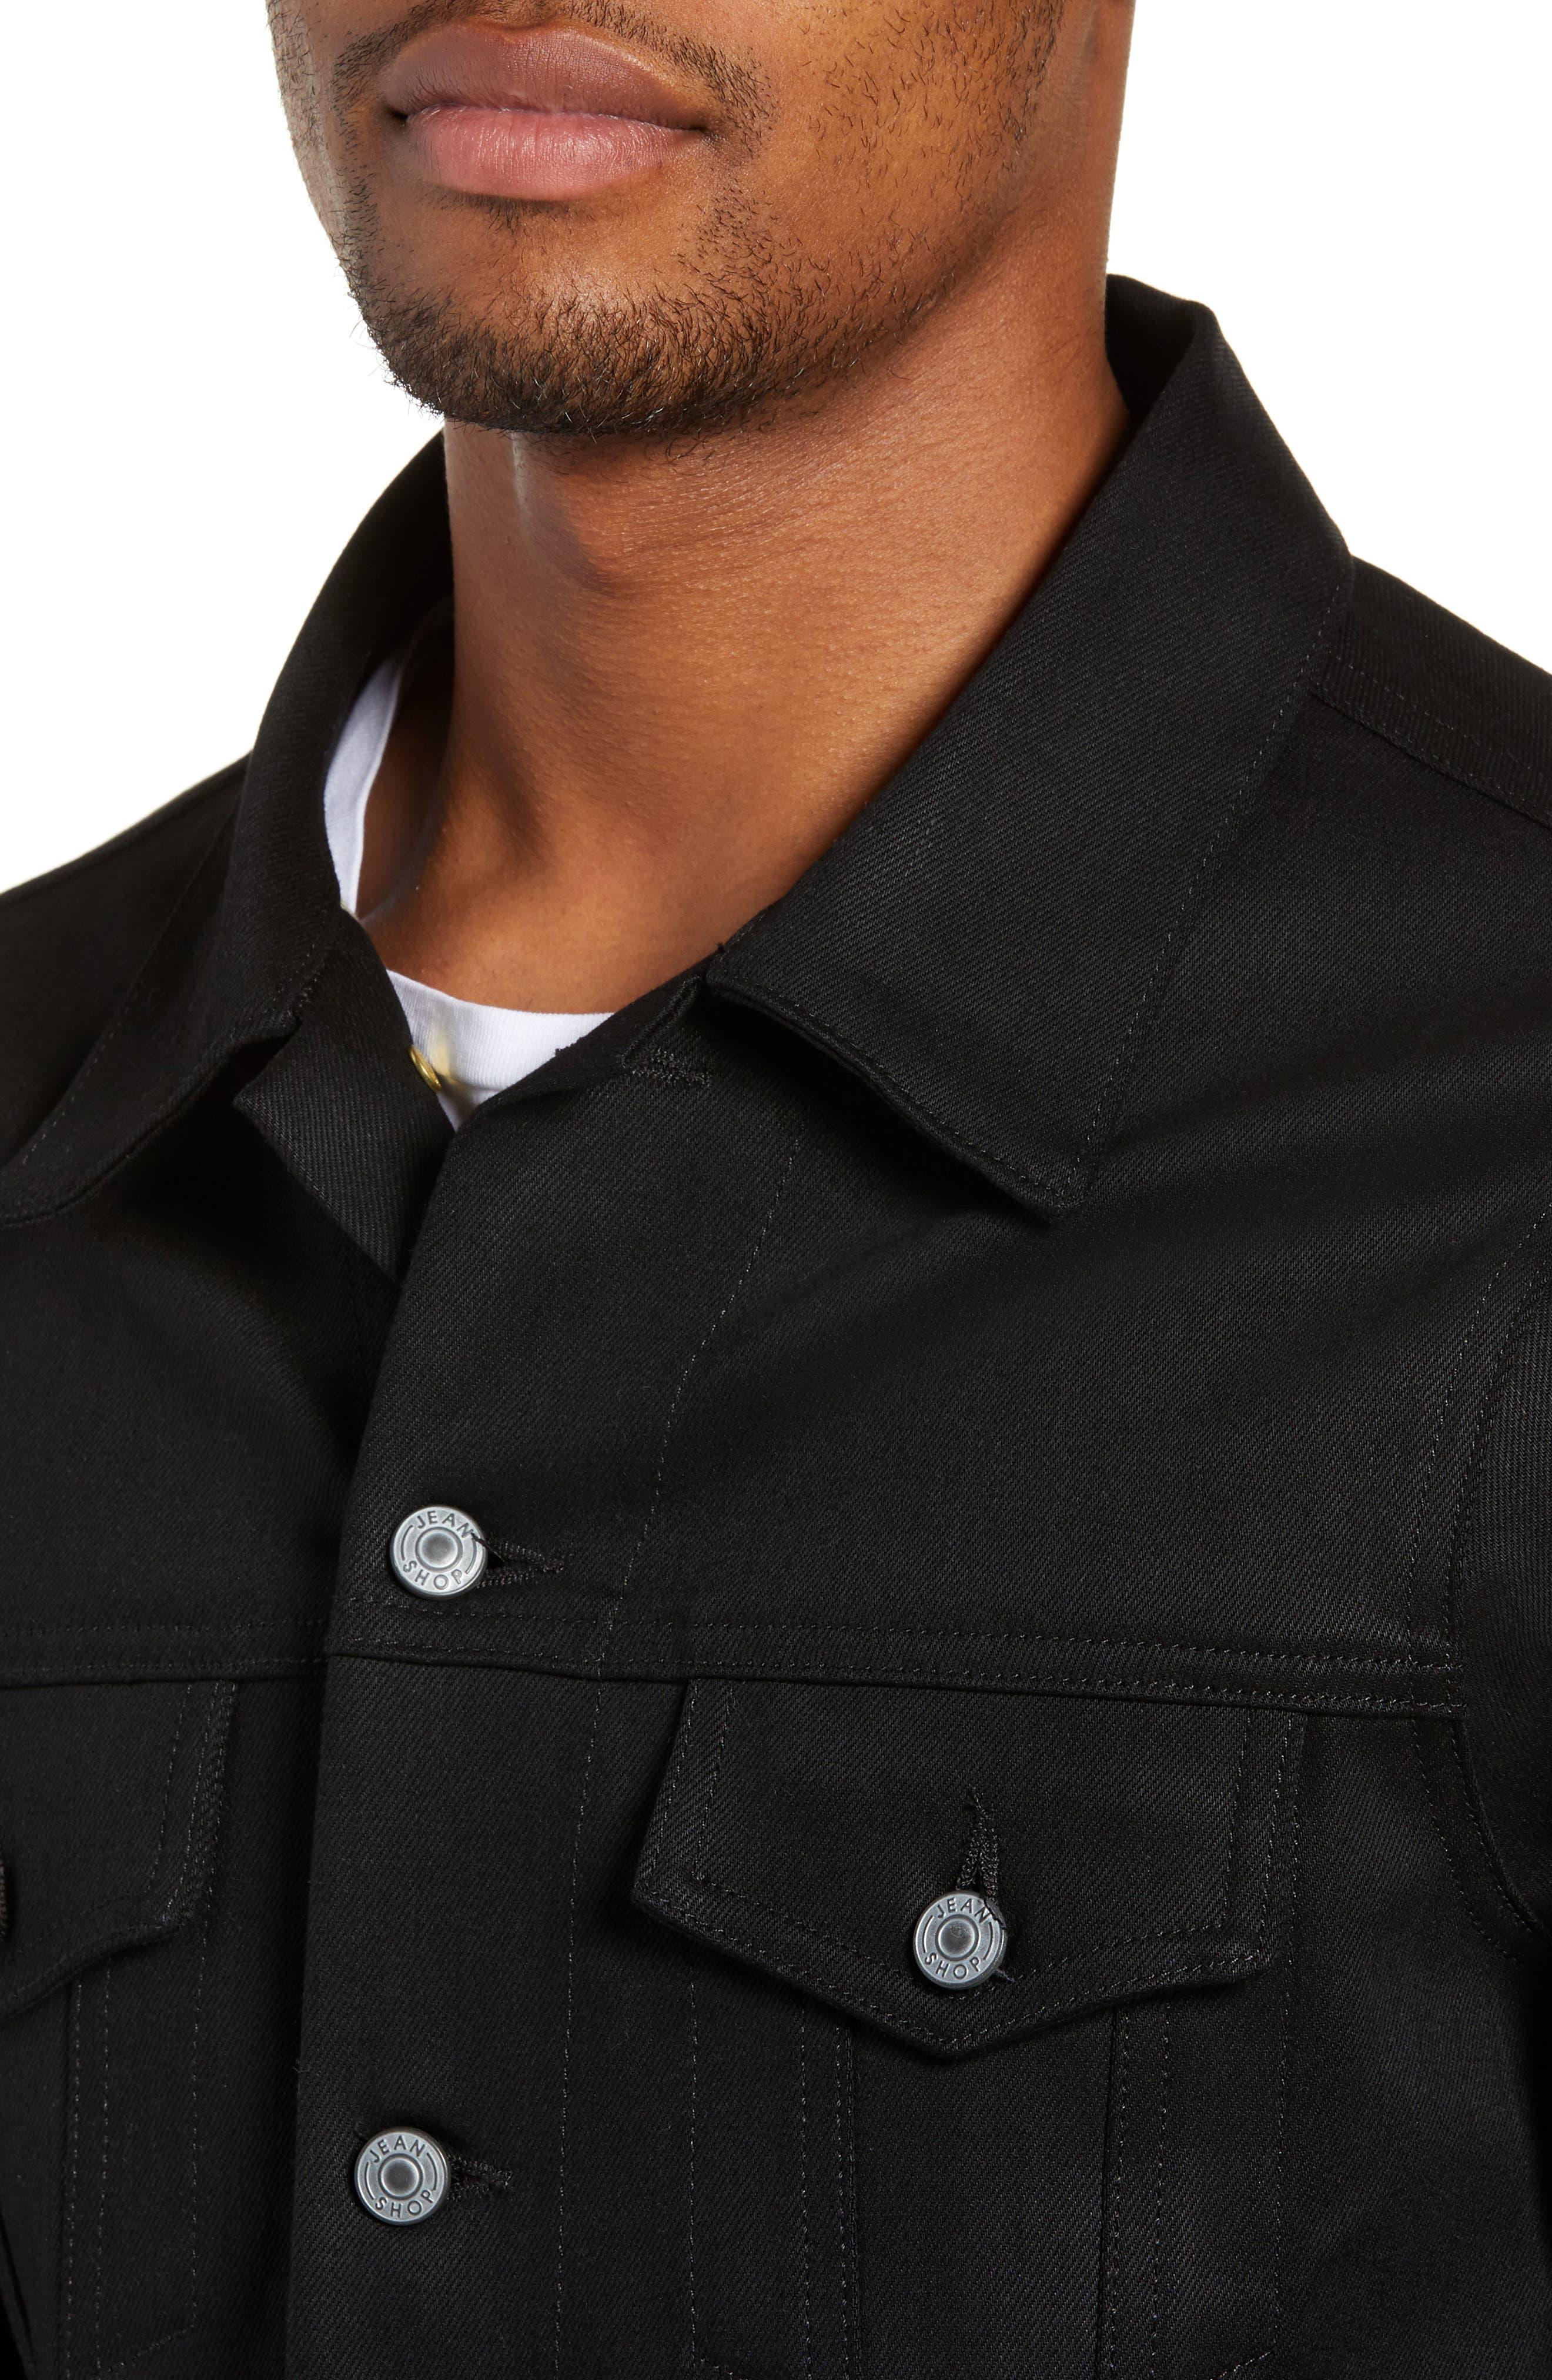 Lou Denim Jacket,                             Alternate thumbnail 4, color,                             RAW